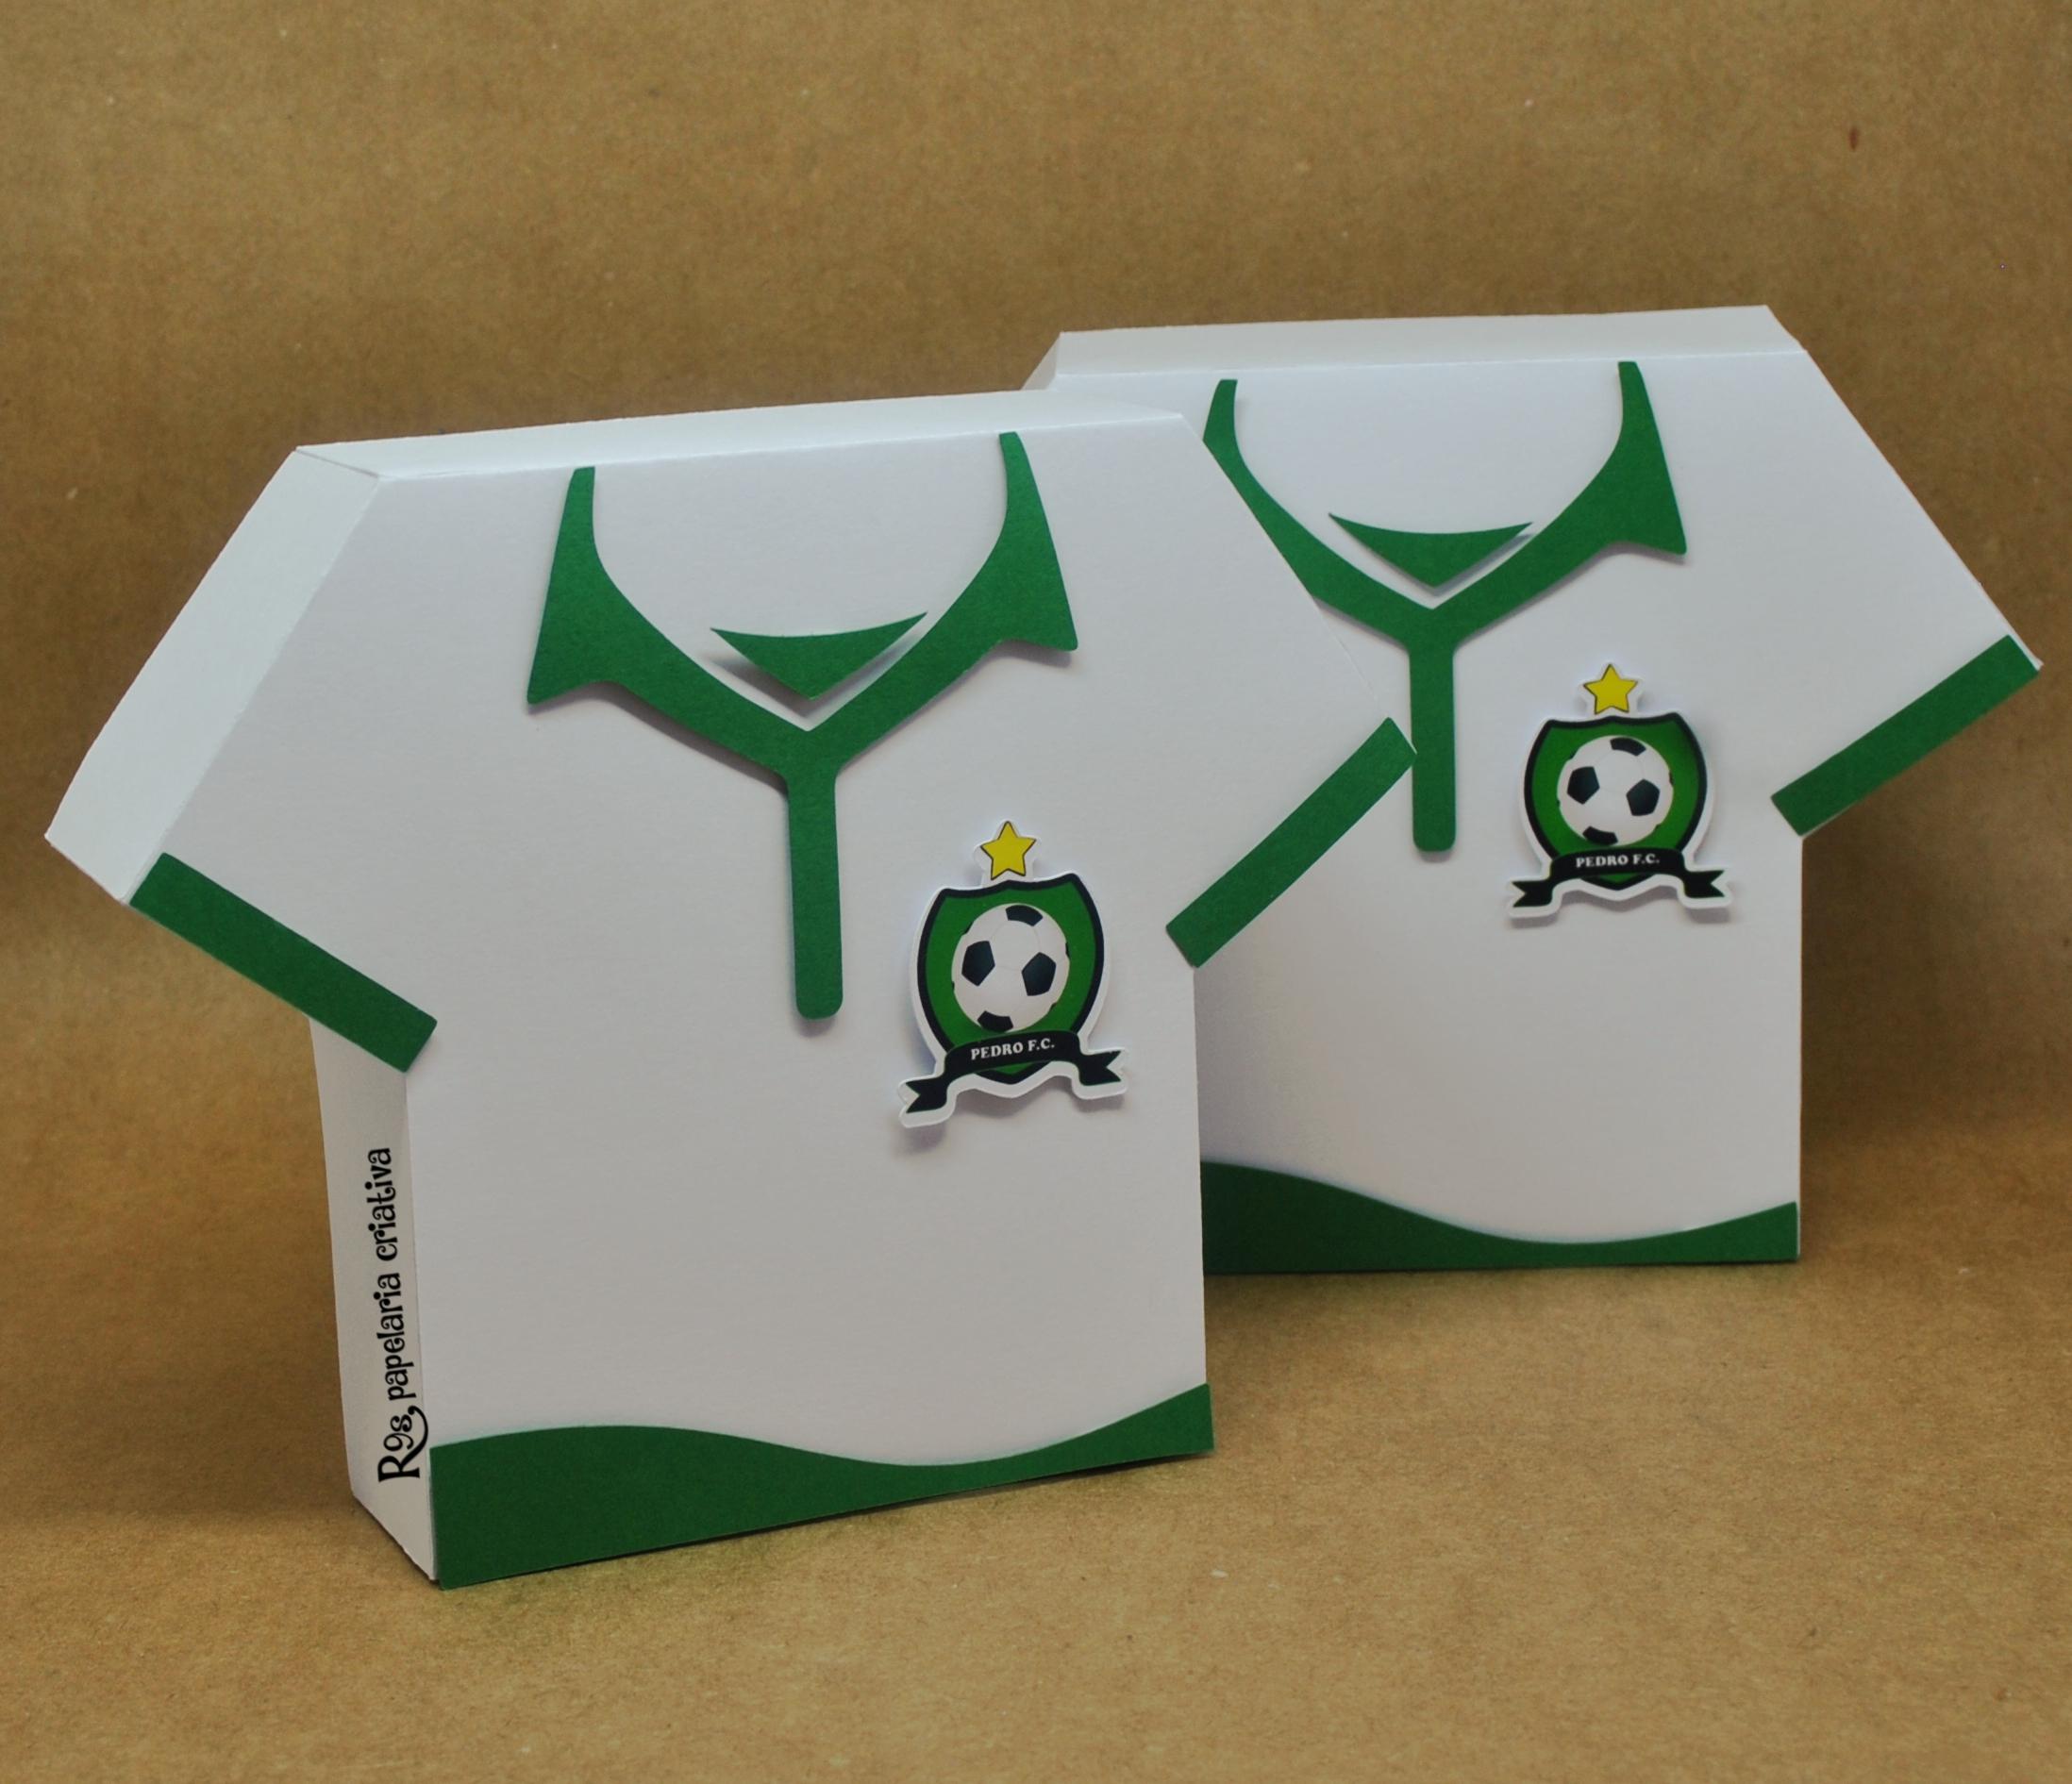 Arquivo de Corte Camisa Futebol Scanncut  91917dd38716b